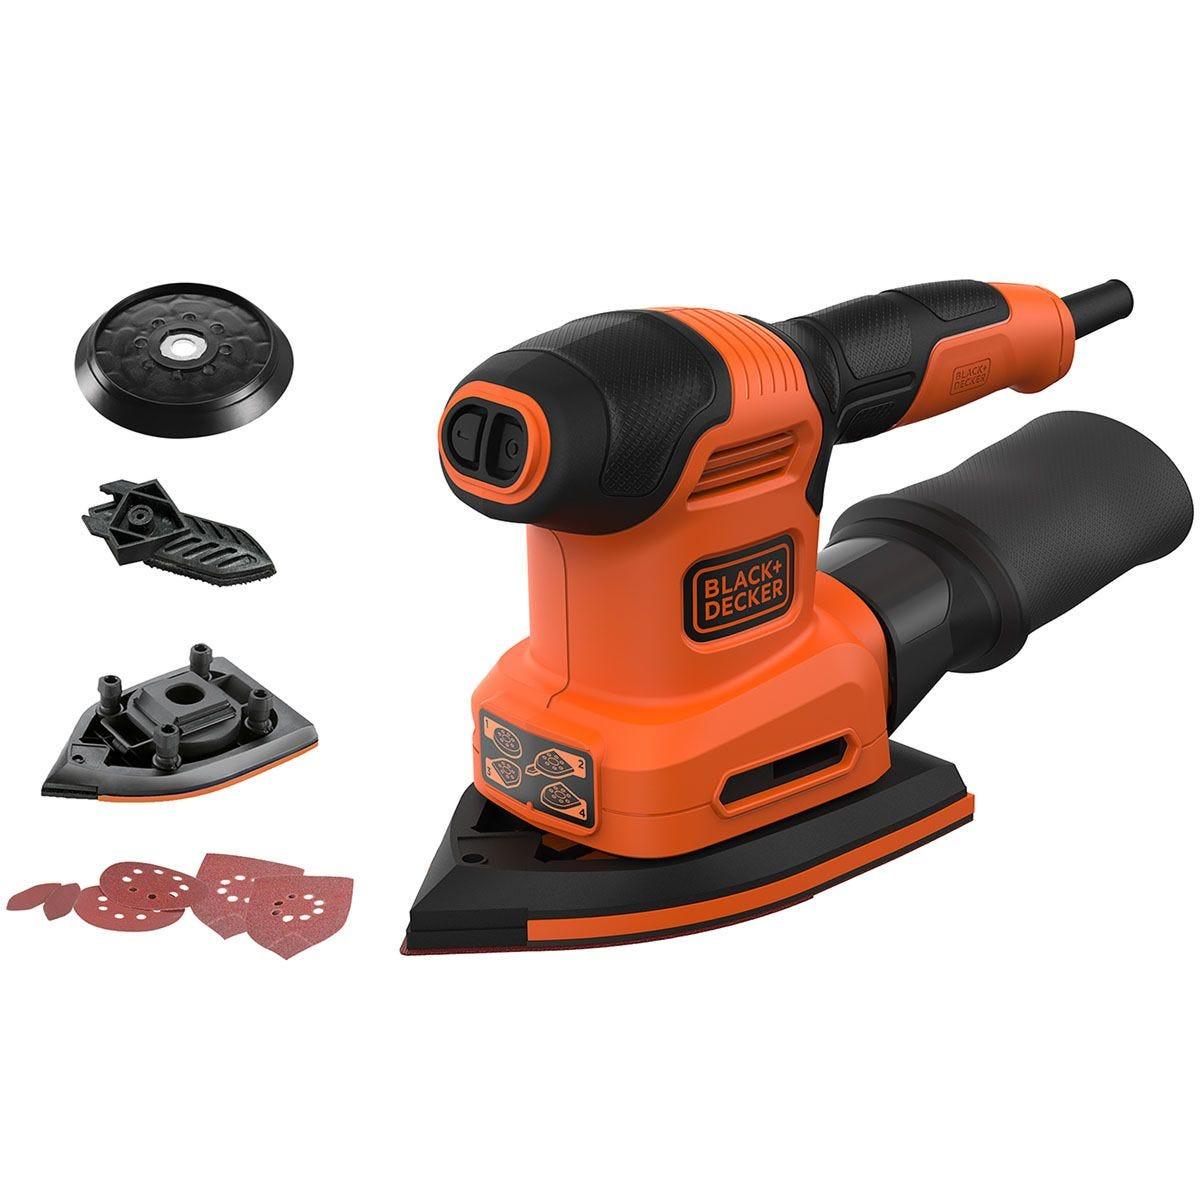 Black & Decker 200W 4-in-1 Multi-Sander - Orange